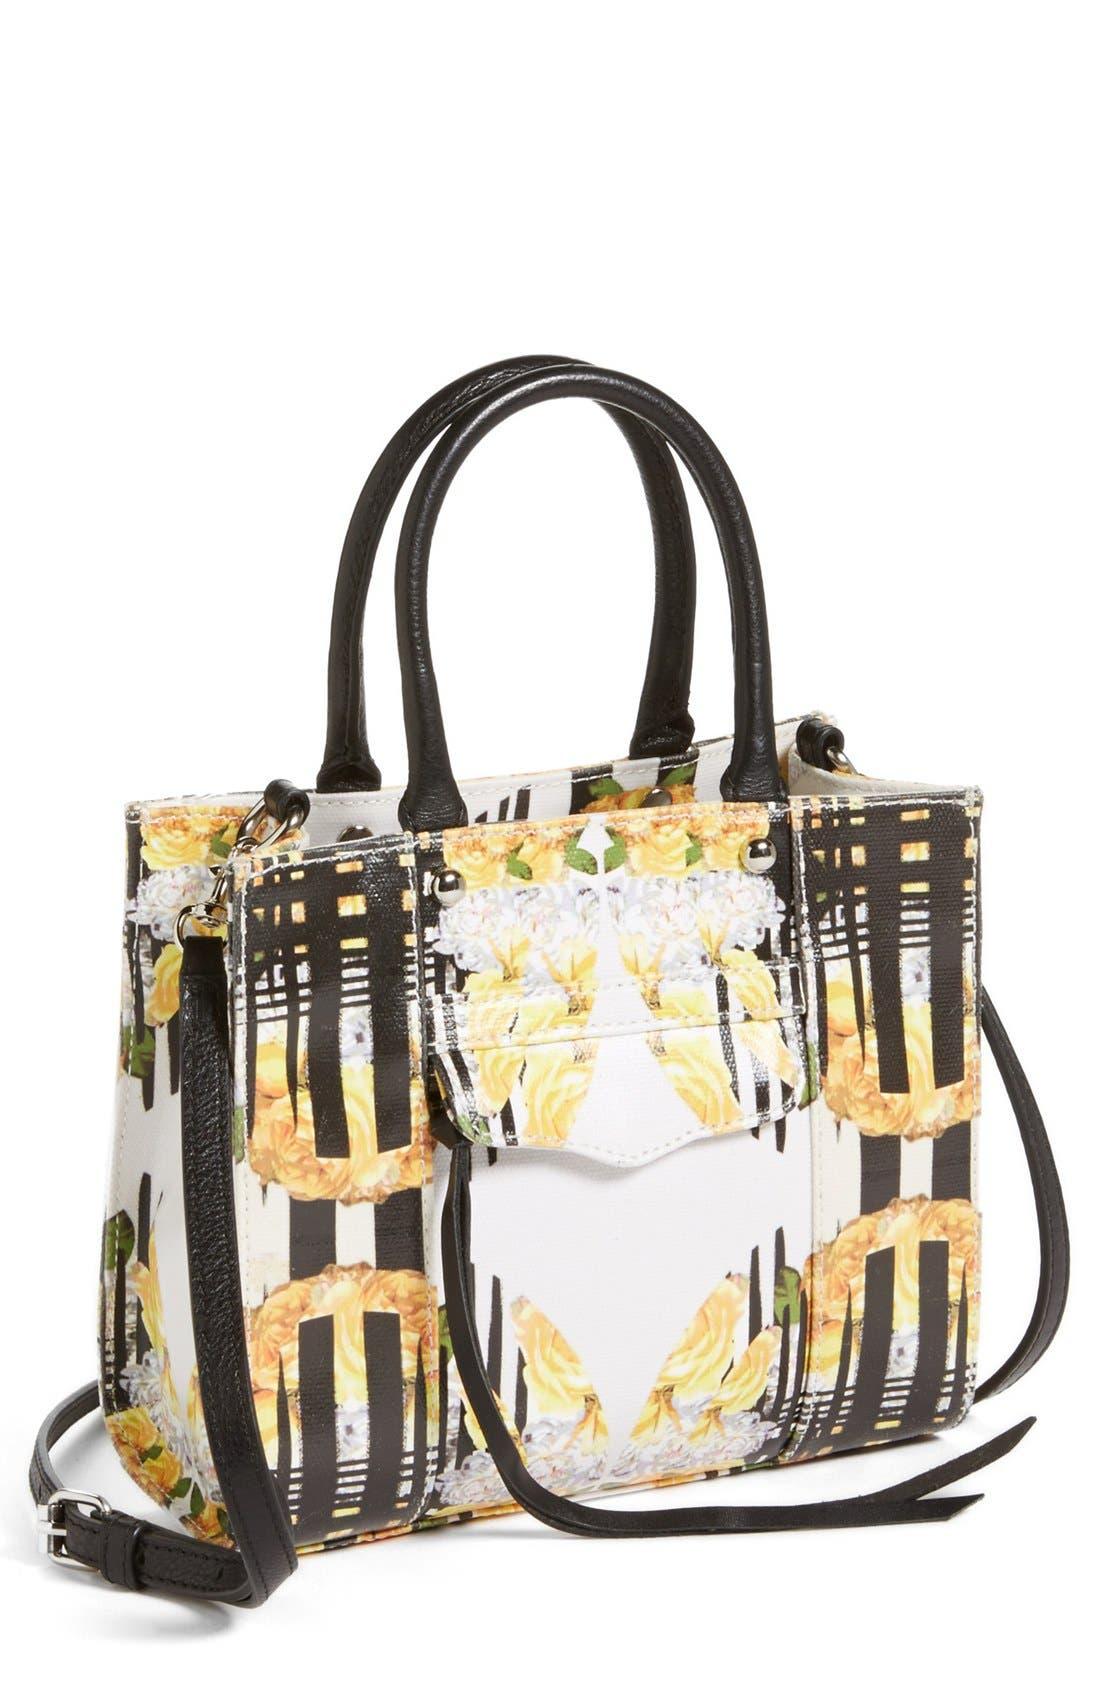 Main Image - Rebecca Minkoff 'Mini MAB Tote' Crossbody Bag